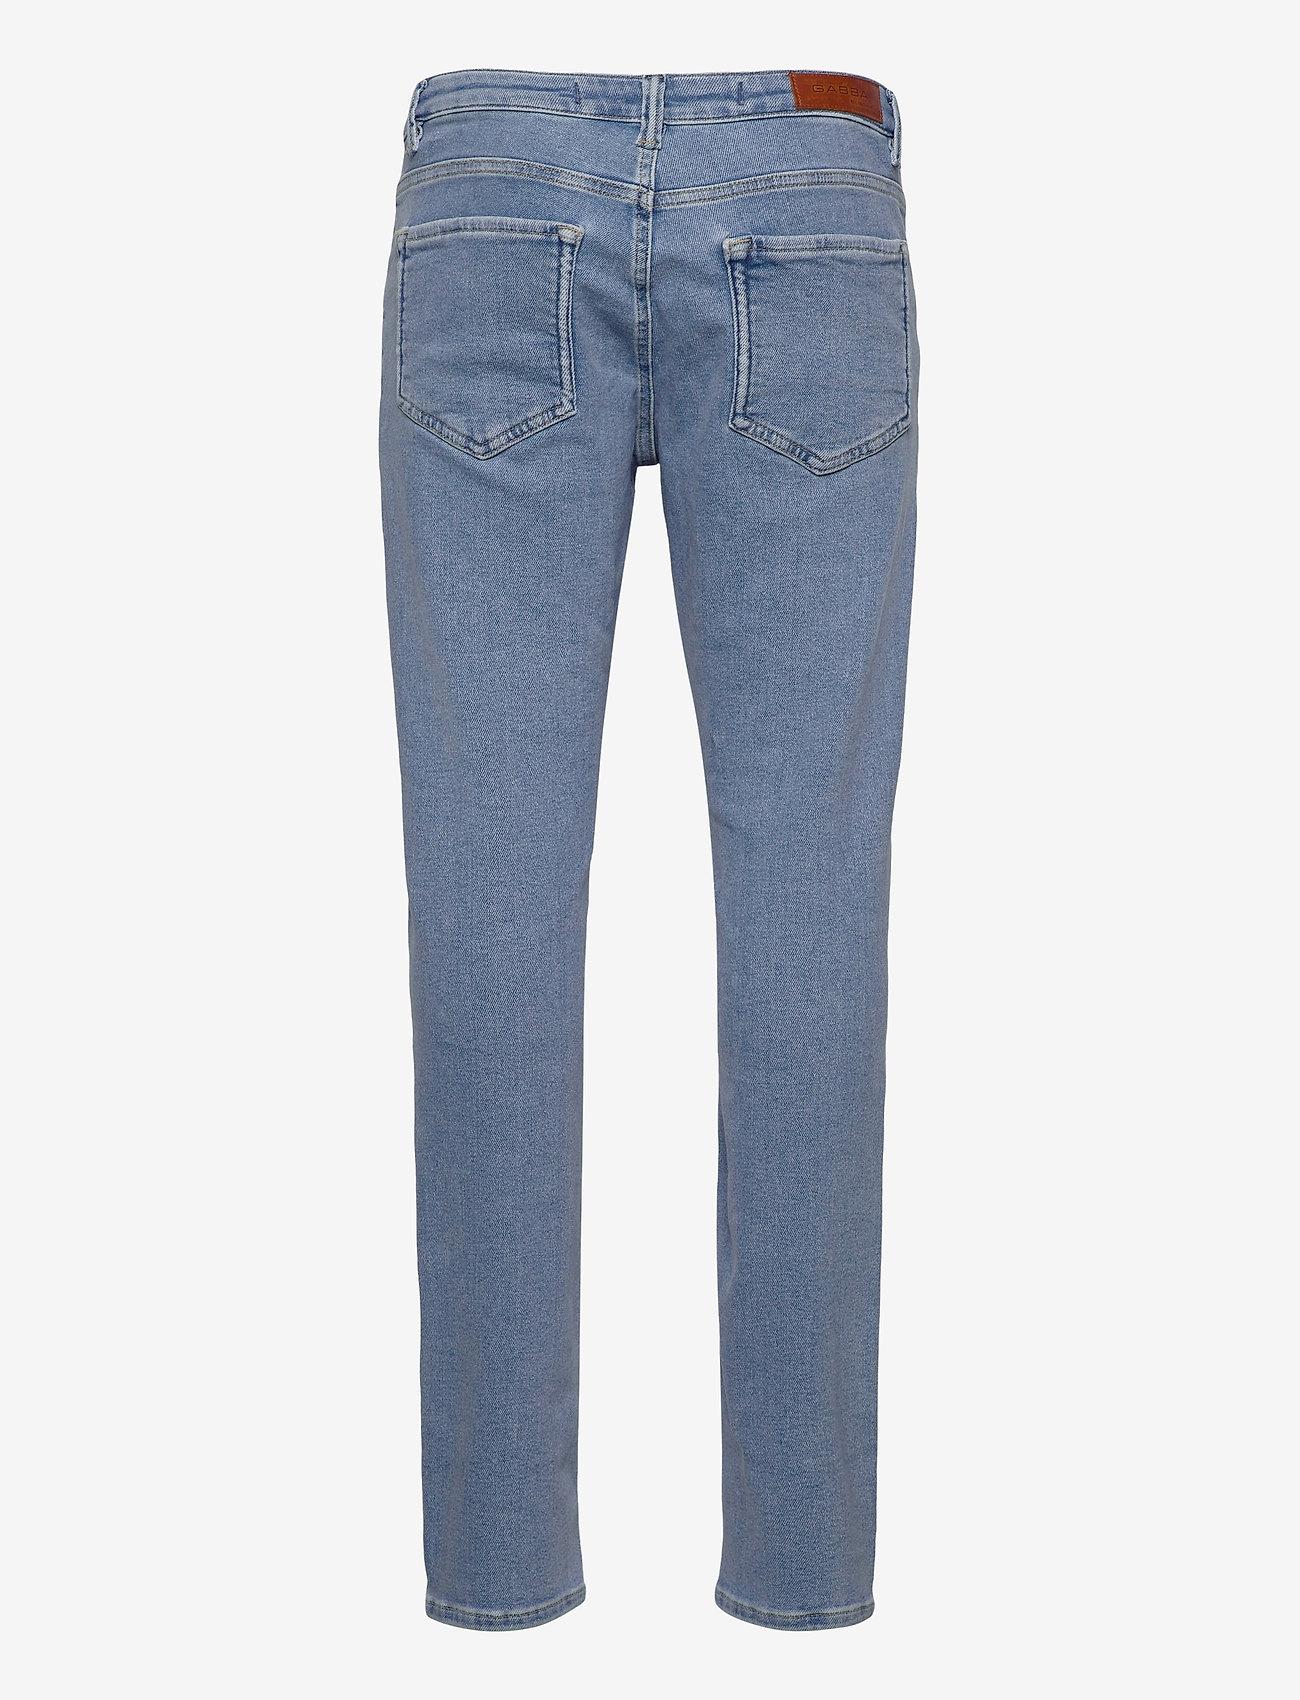 Gabba - Jones K3826 Jeans - slim jeans - rs1359 - 1